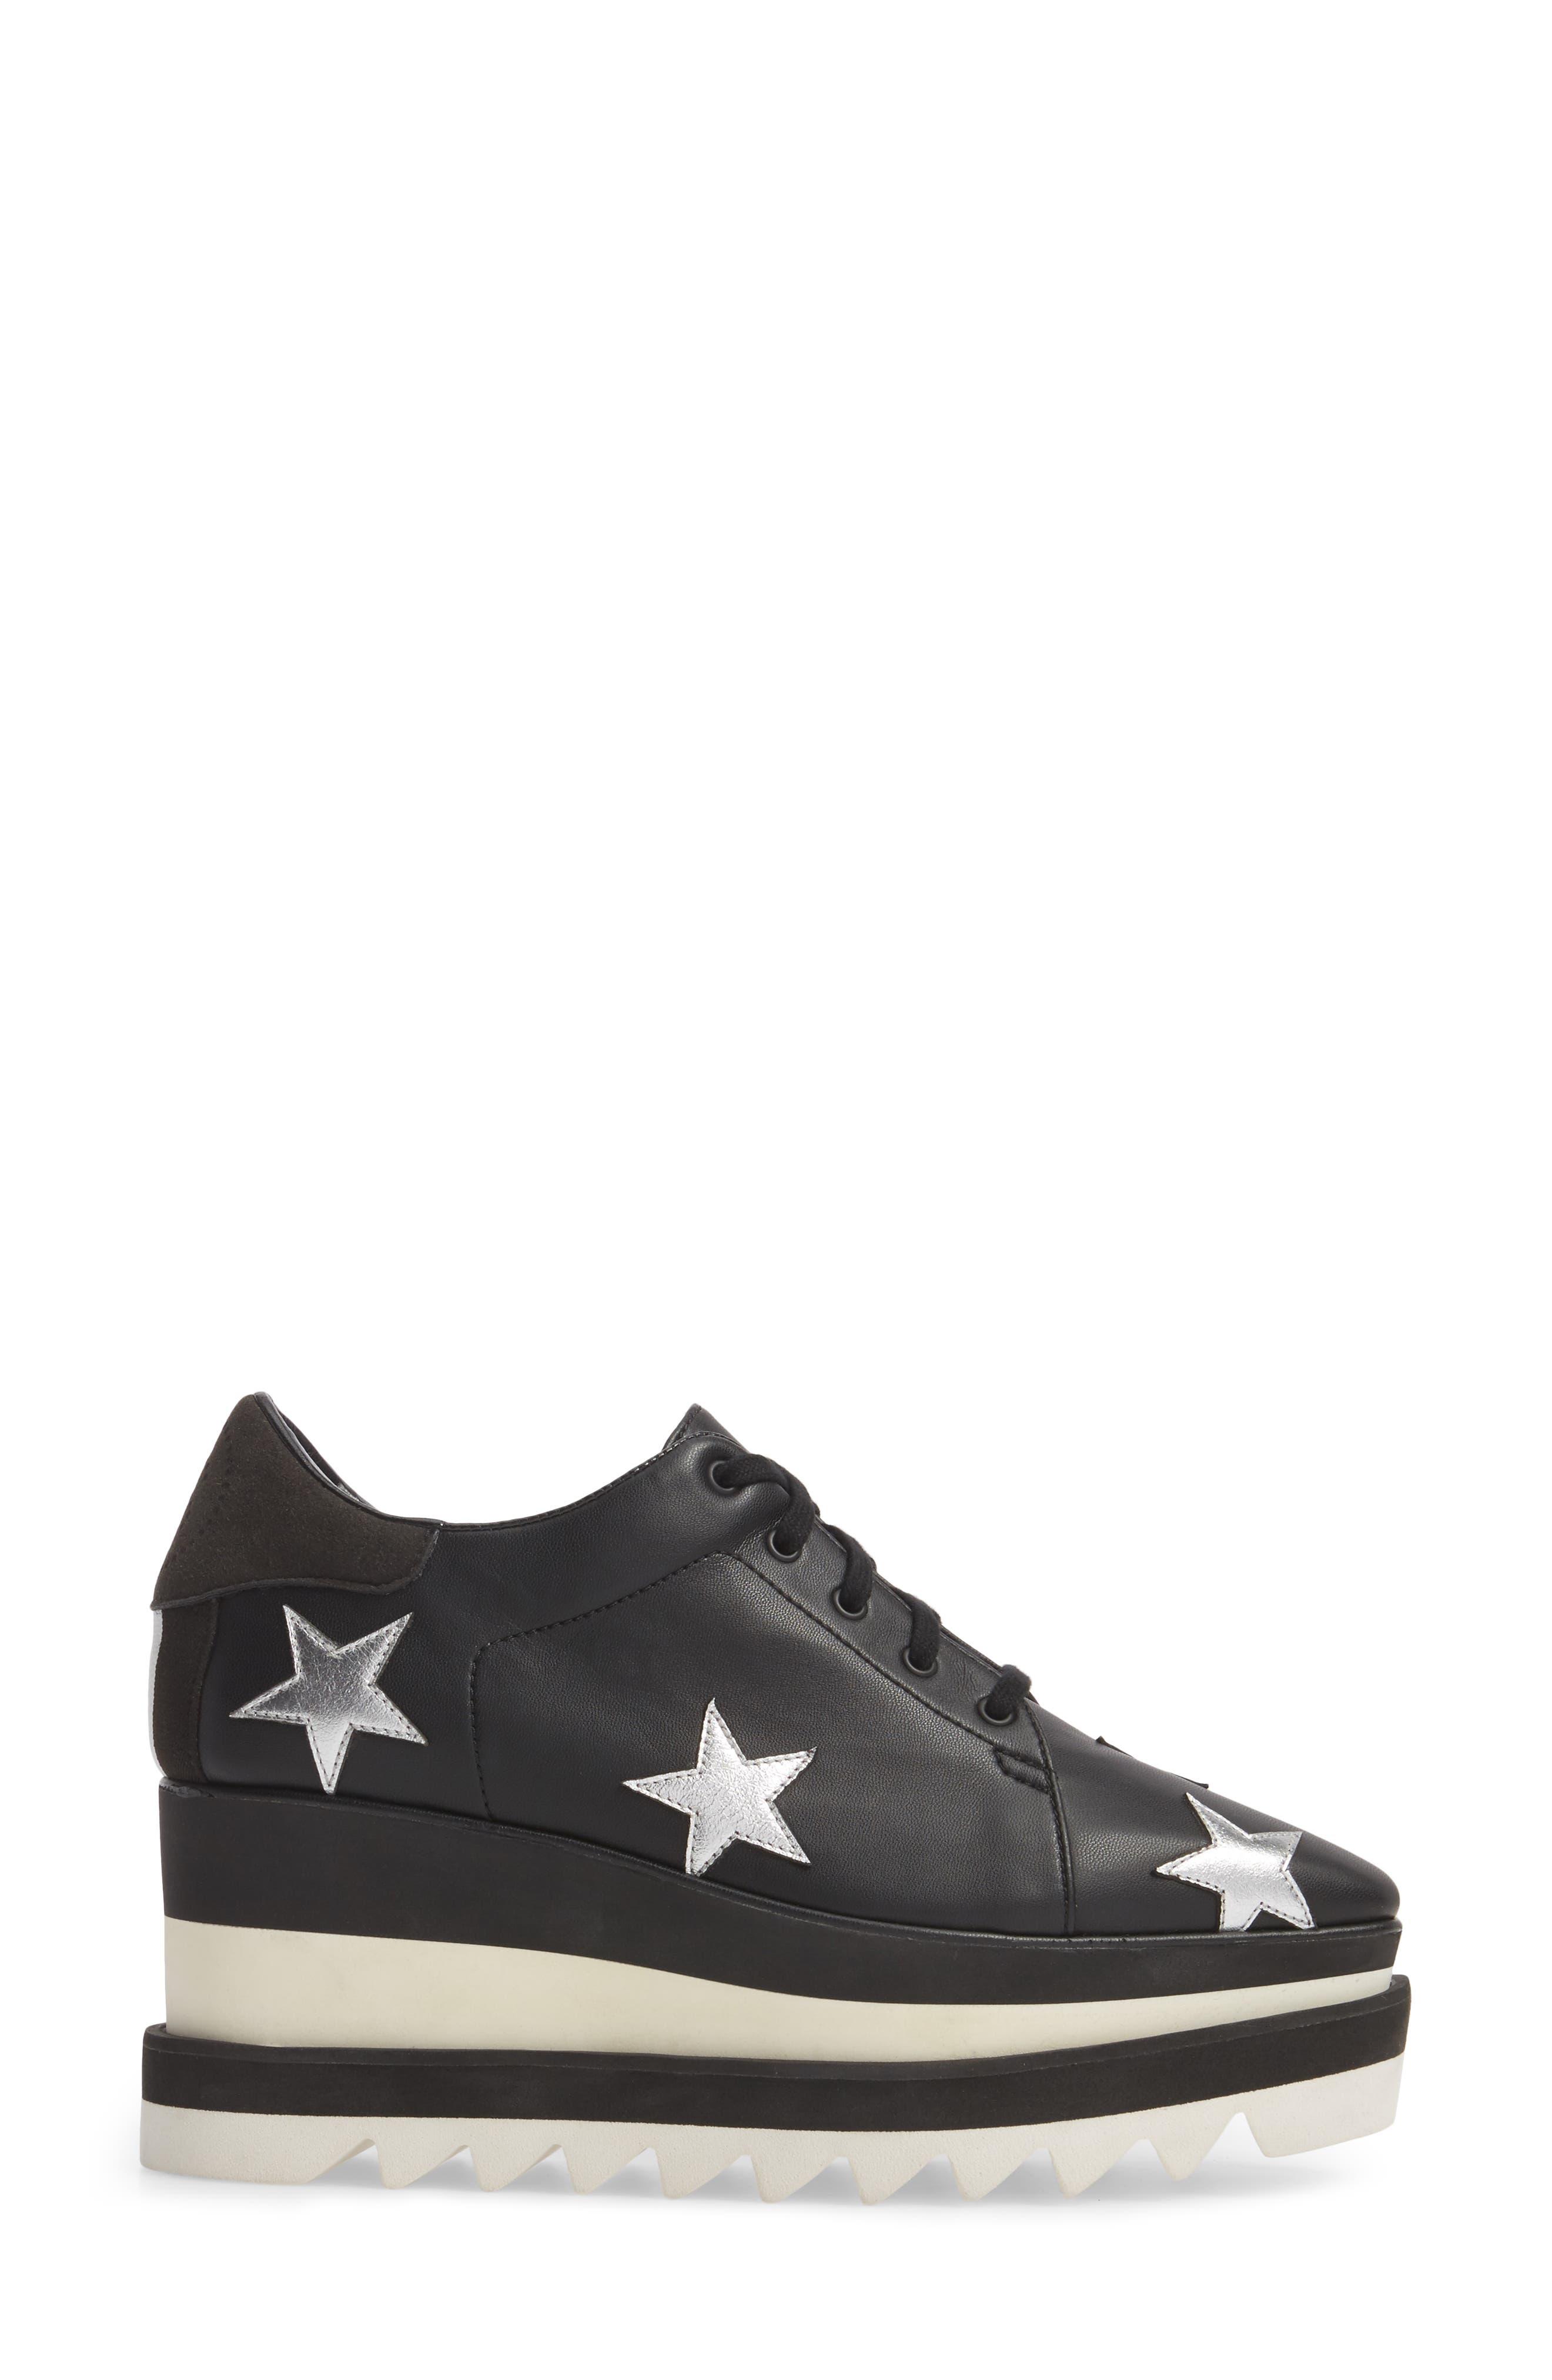 Elyse Platform Sneaker,                             Alternate thumbnail 3, color,                             BLACK